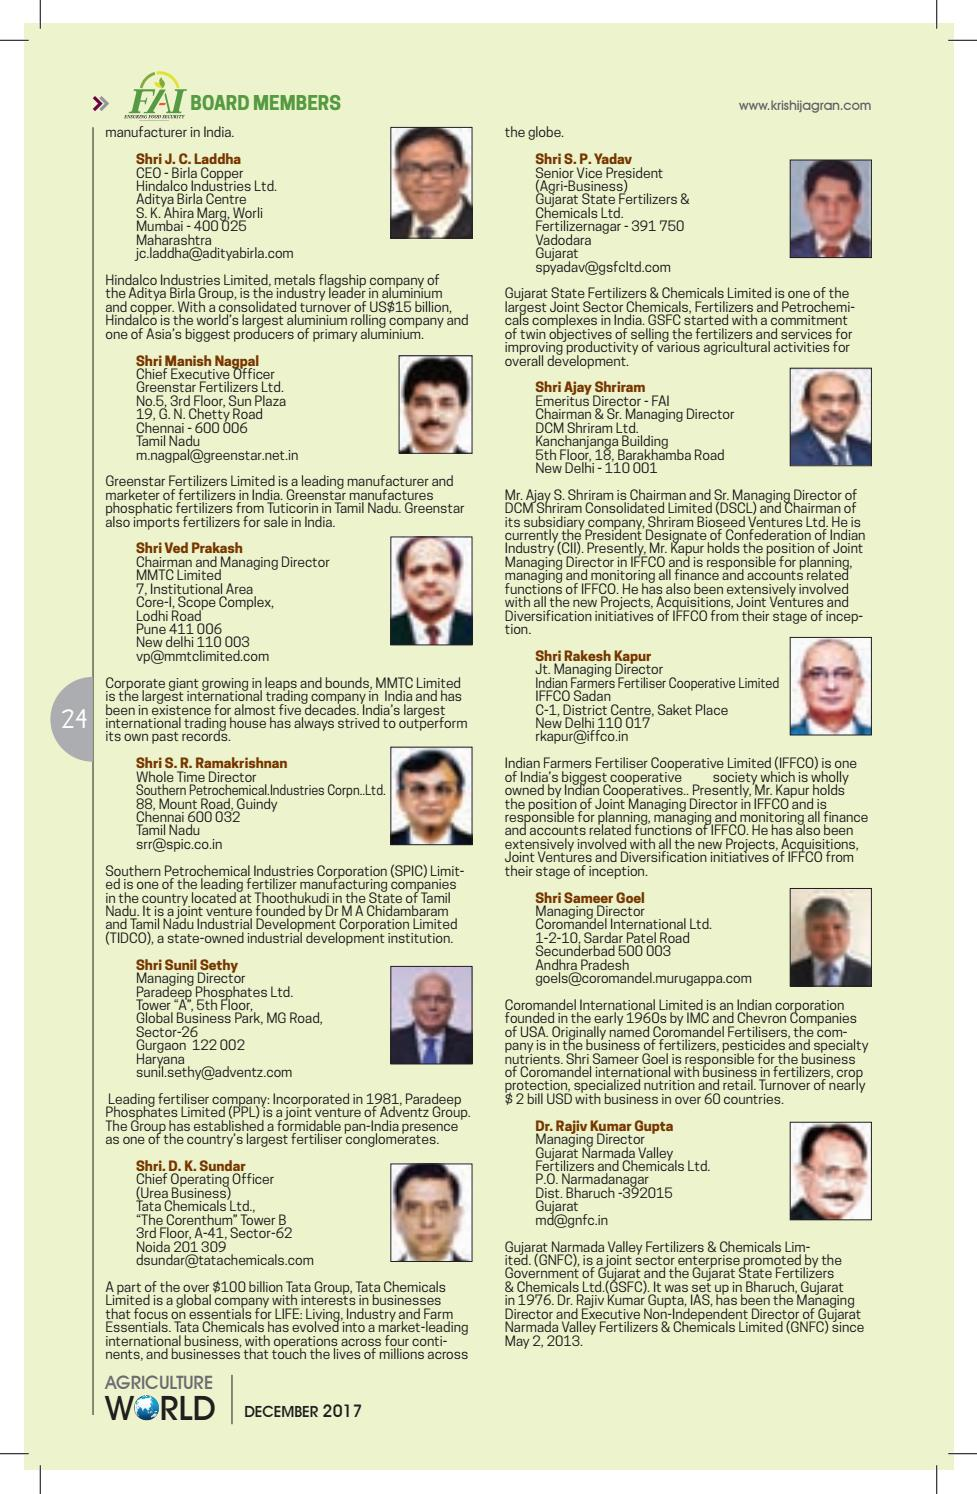 Agriculture world December 2017 by Krishi Jagran - issuu